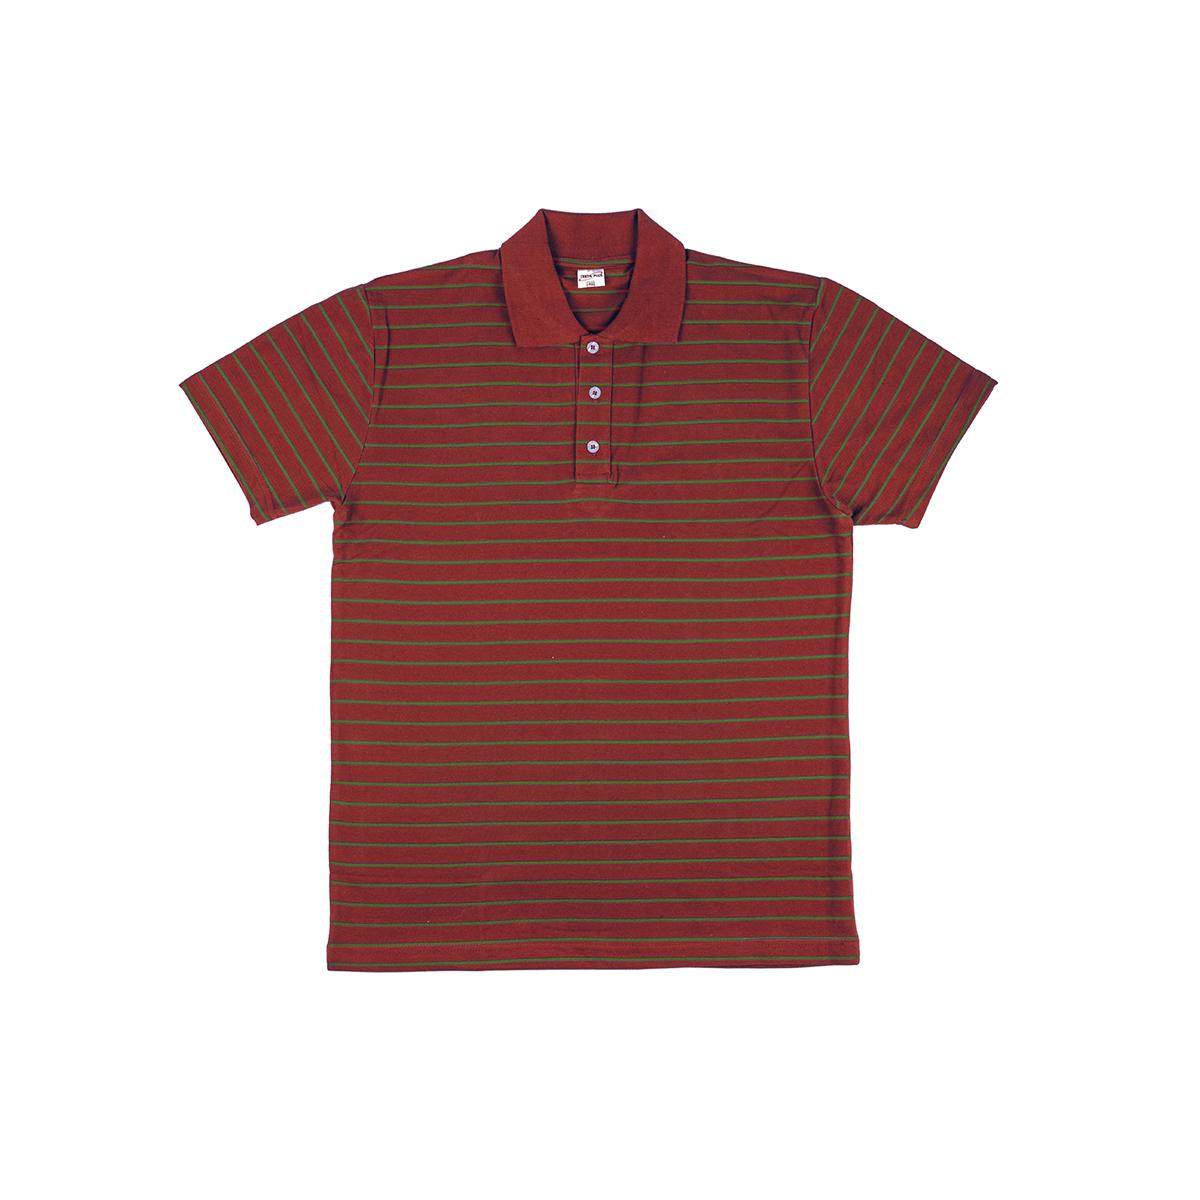 Мужская футболка-поло Stripe Polo Красный, размер 48Футболки и майки<br><br><br>Тип: Муж. футболка<br>Размер: 48<br>Материал: Хлопок